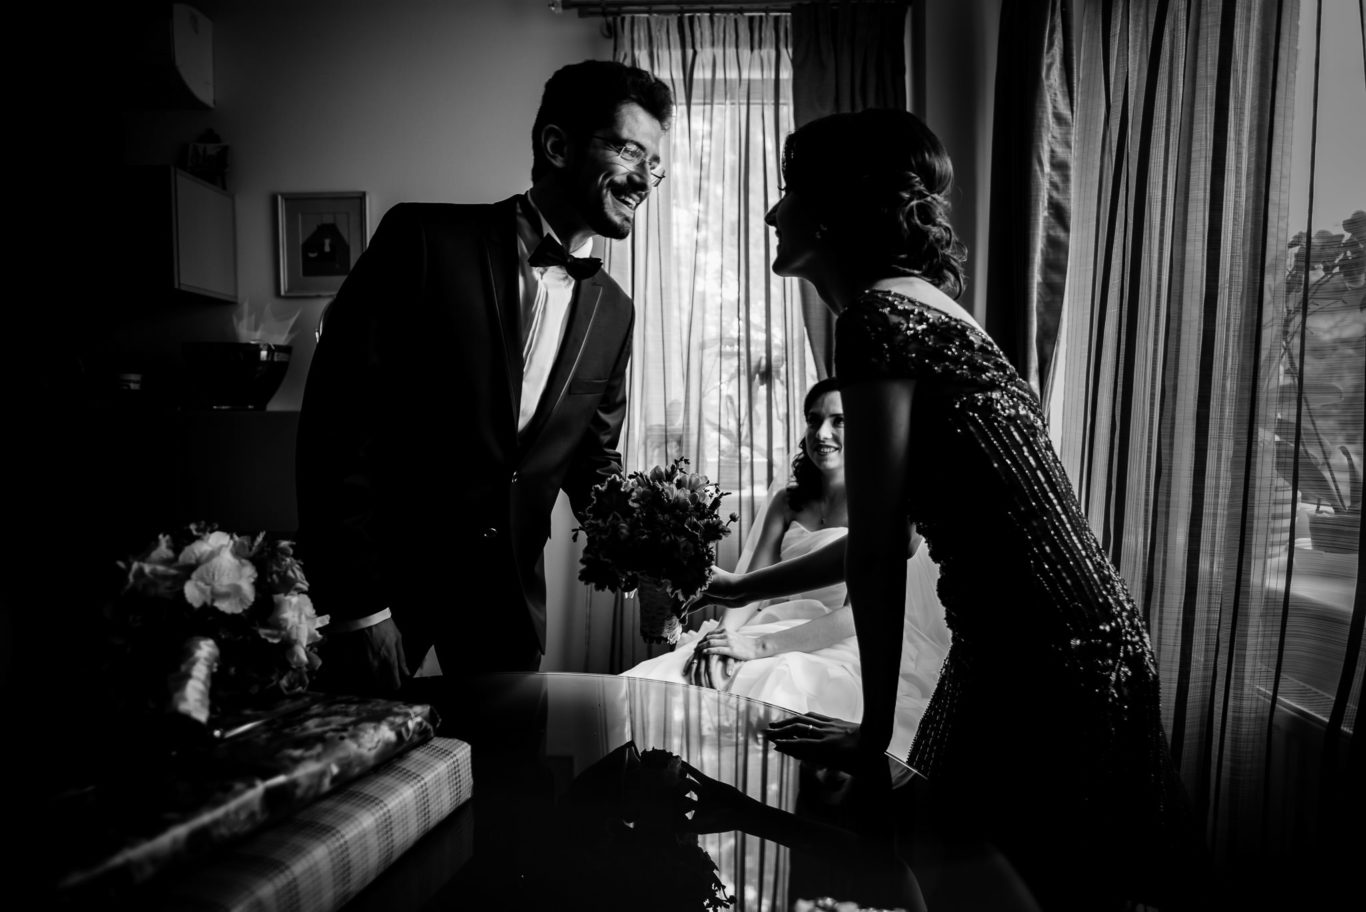 0352-Fotografie-nunta-Simona-Valentin-fotograf-Ciprian-Dumitrescu-DSC_1348